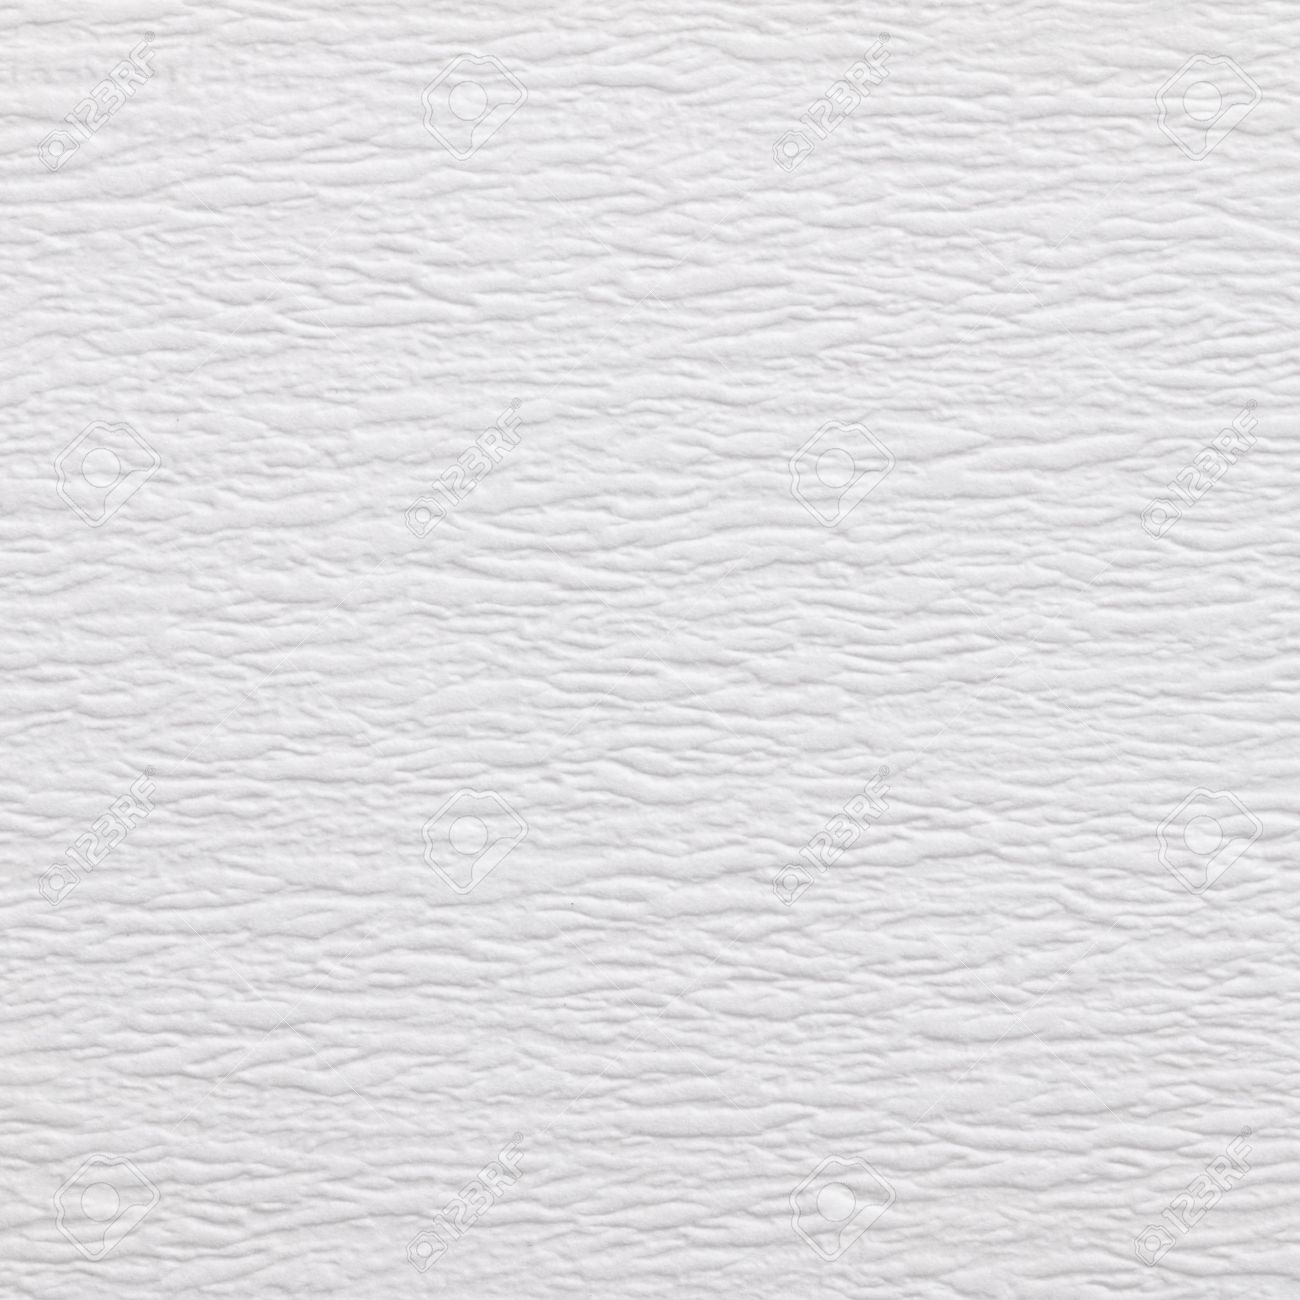 Art Paper Textured Background - Soft Wave Stripes,light Colour ...